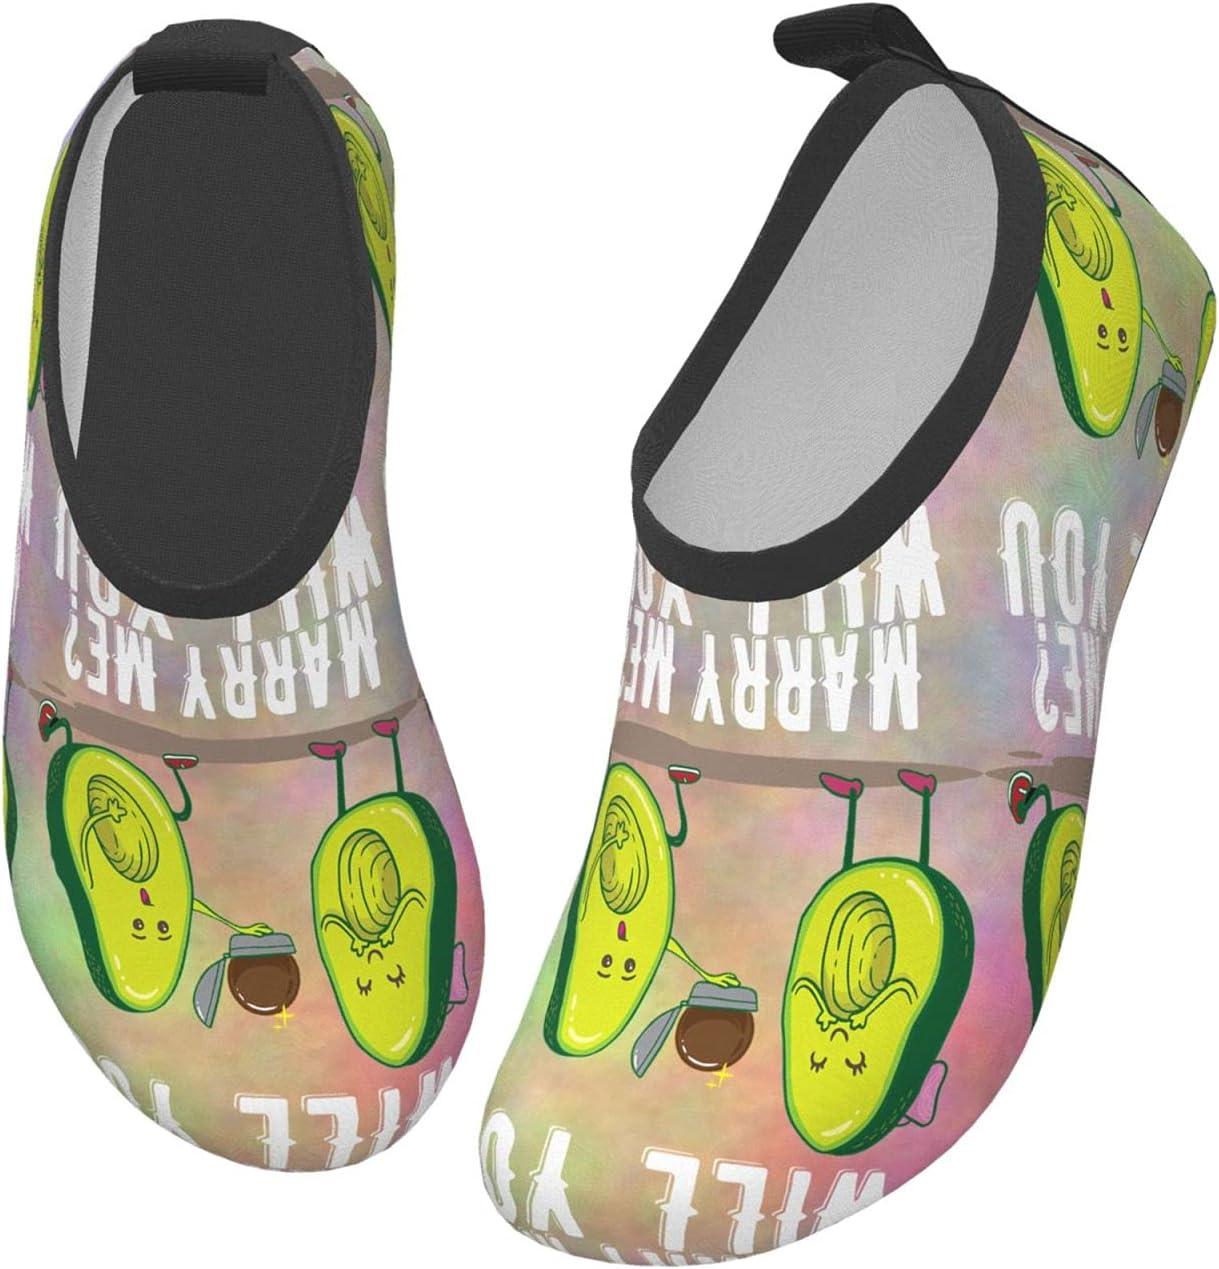 wobzfrok Will You Marry Me Avocado Kids Water Shoes Girls Boys Toddler Non-Slip Quick Dry Aqua Socks for Beach Swim Walking 34/35